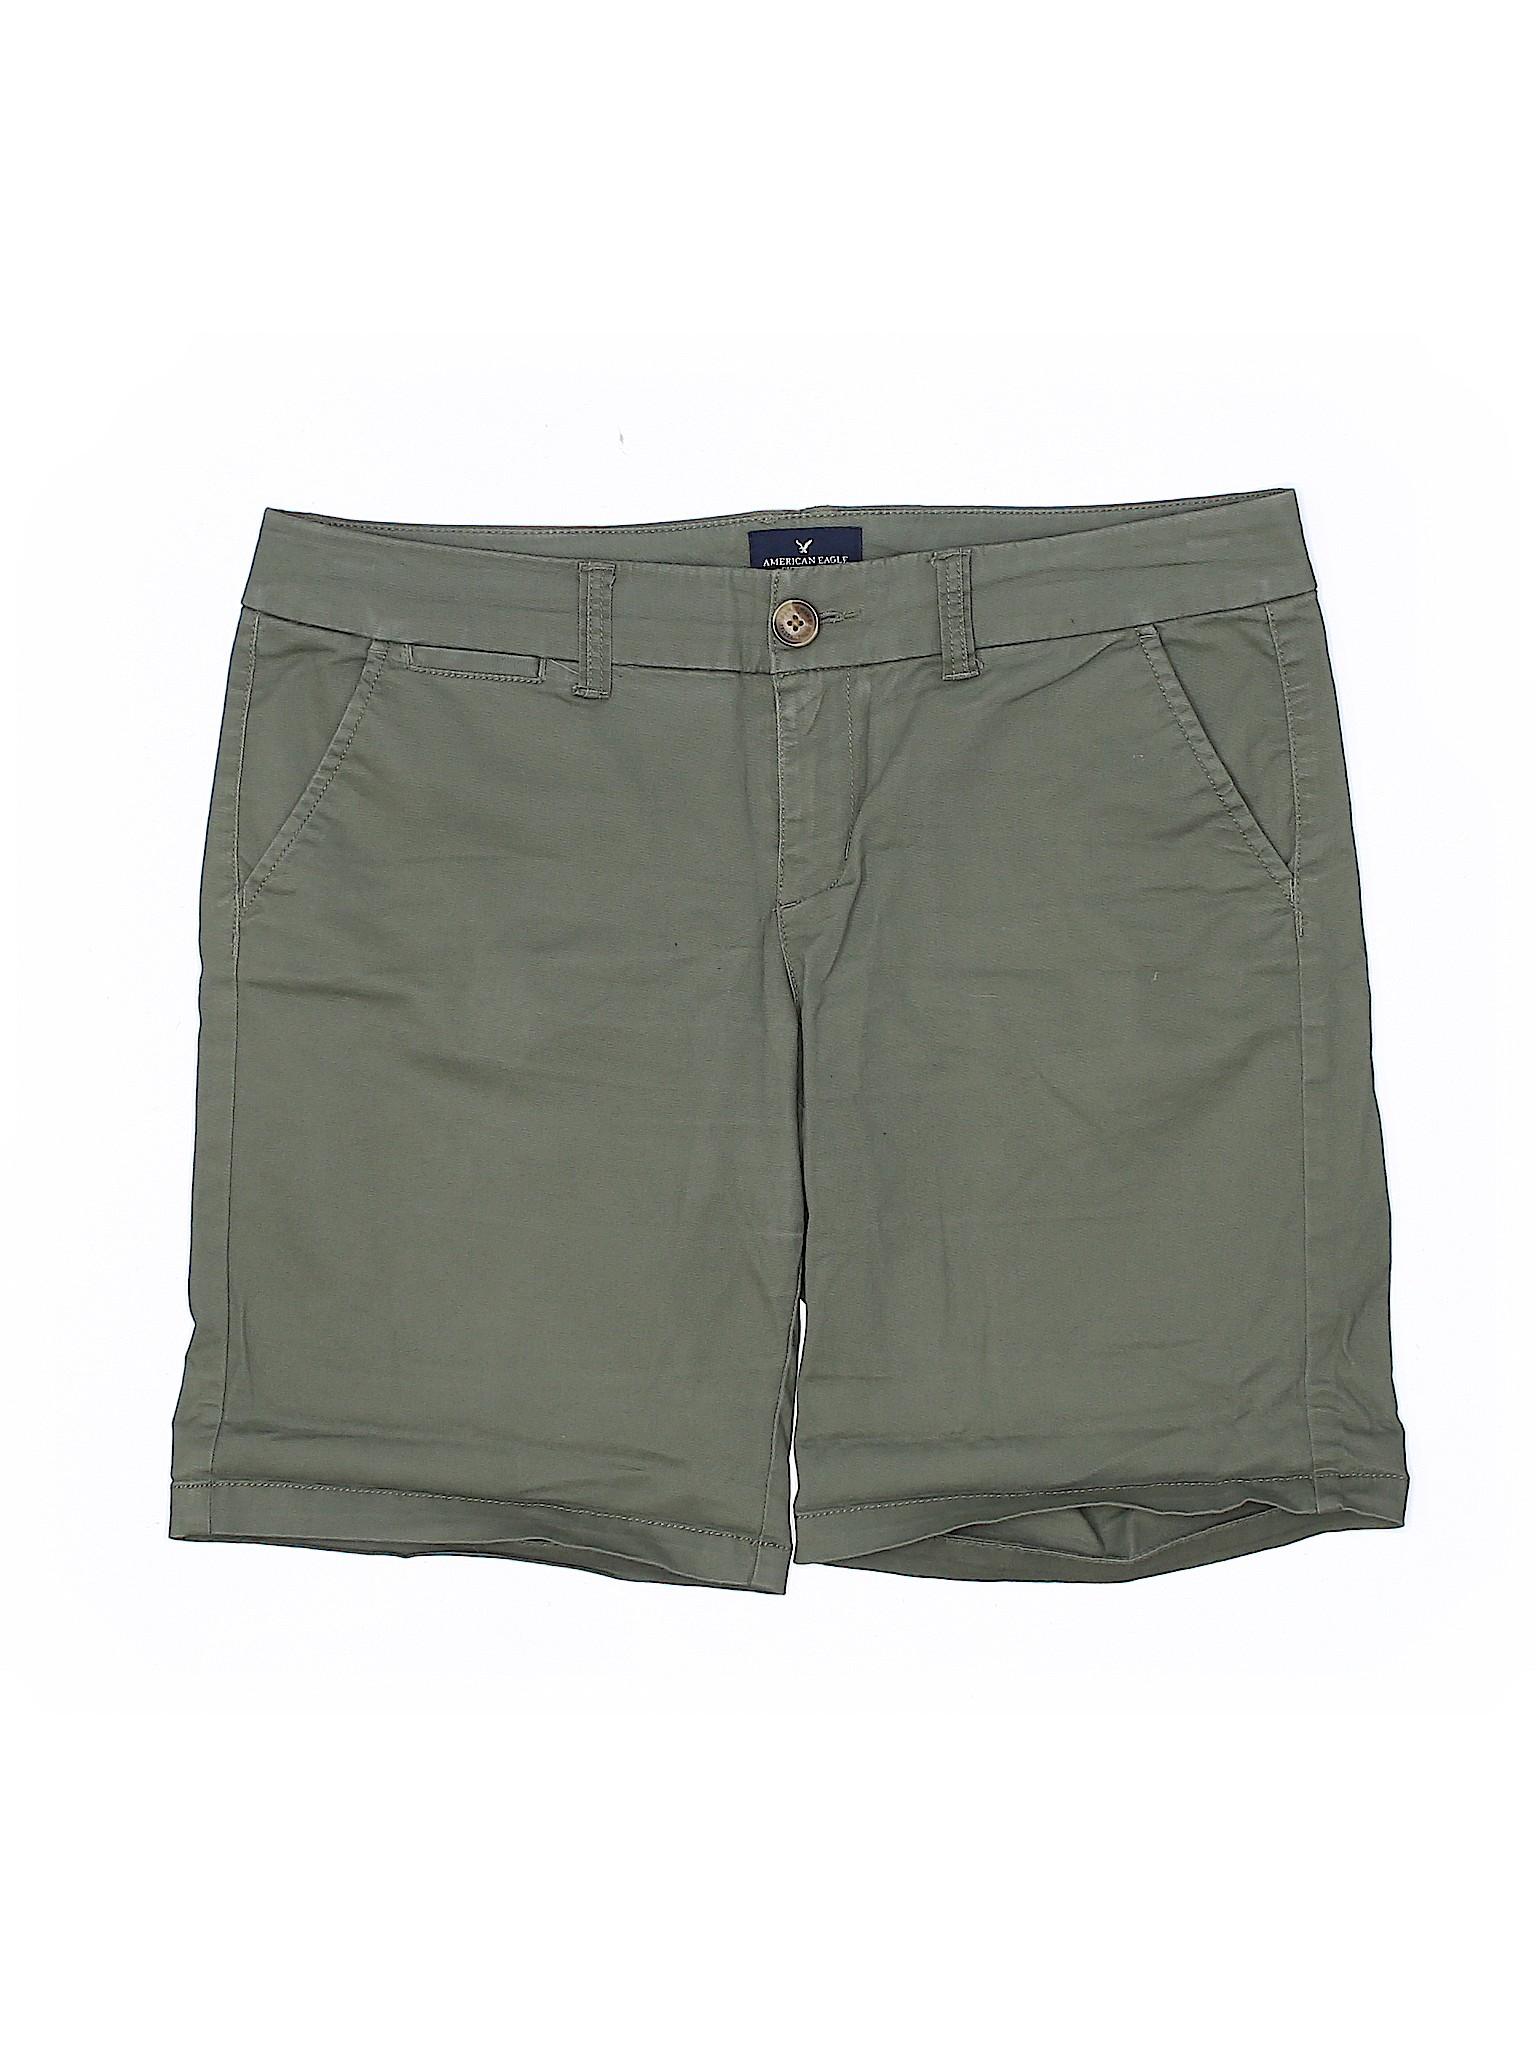 Khaki Outfitters Boutique Shorts American Eagle Pwq8fTfRt